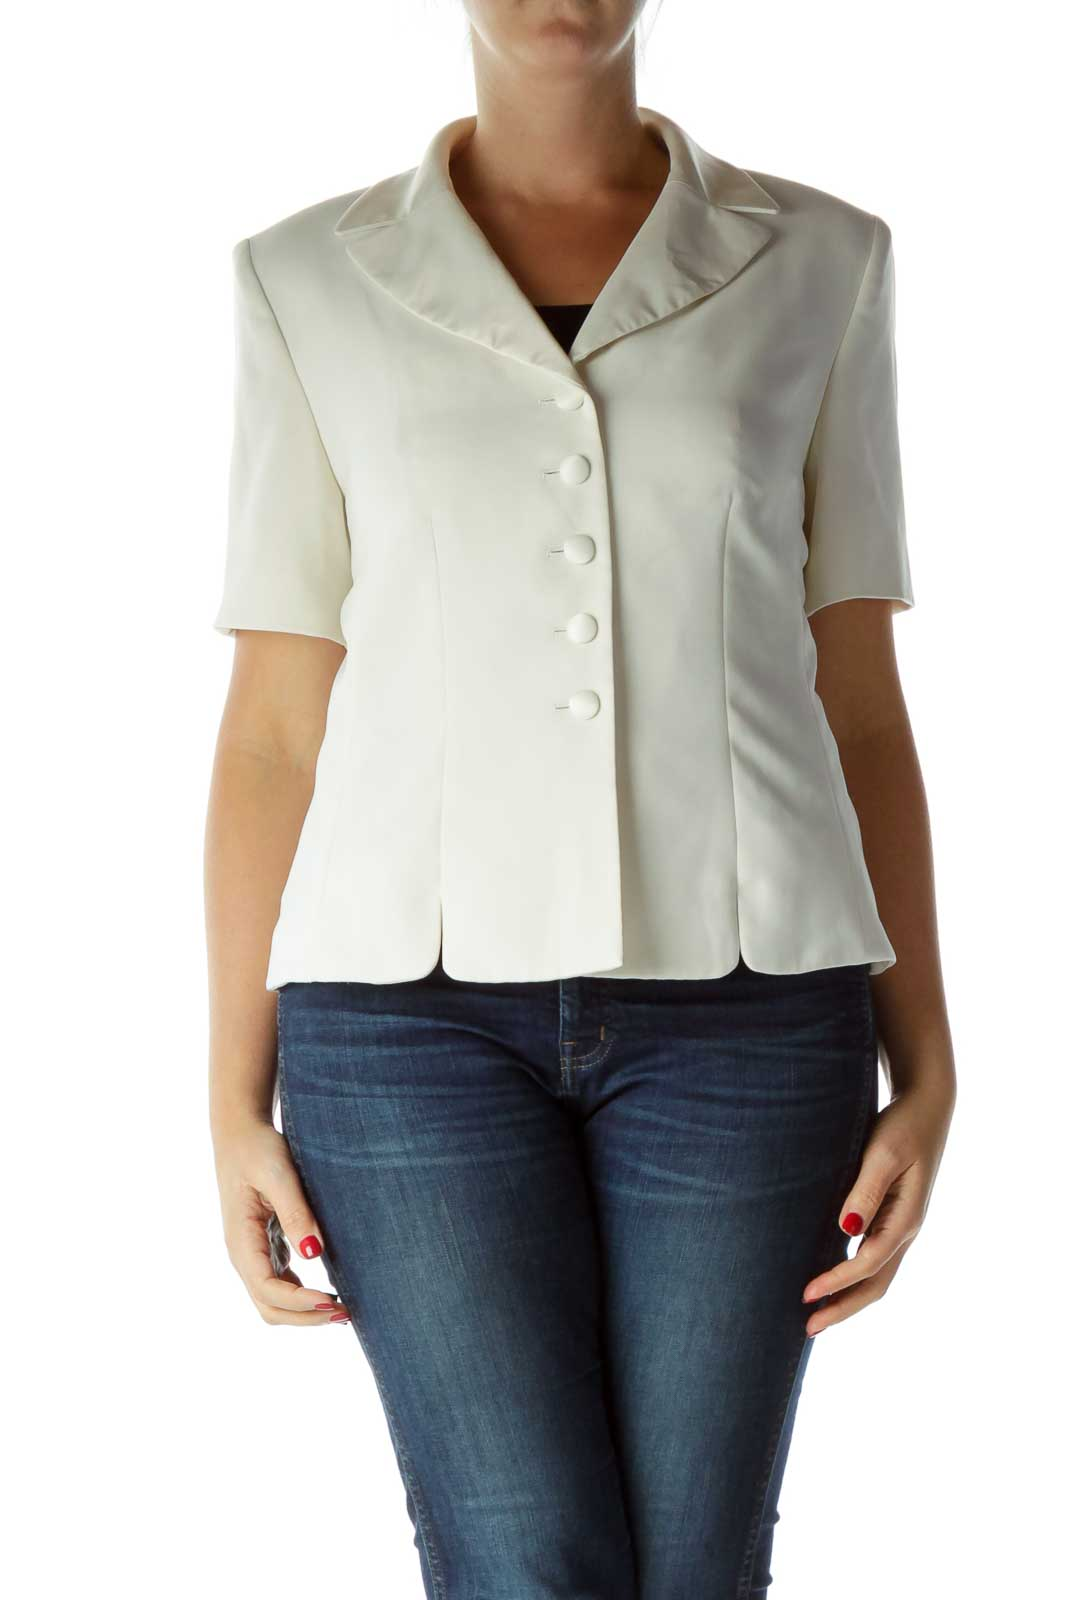 Cream Short Sleeve Suit Jacket Front